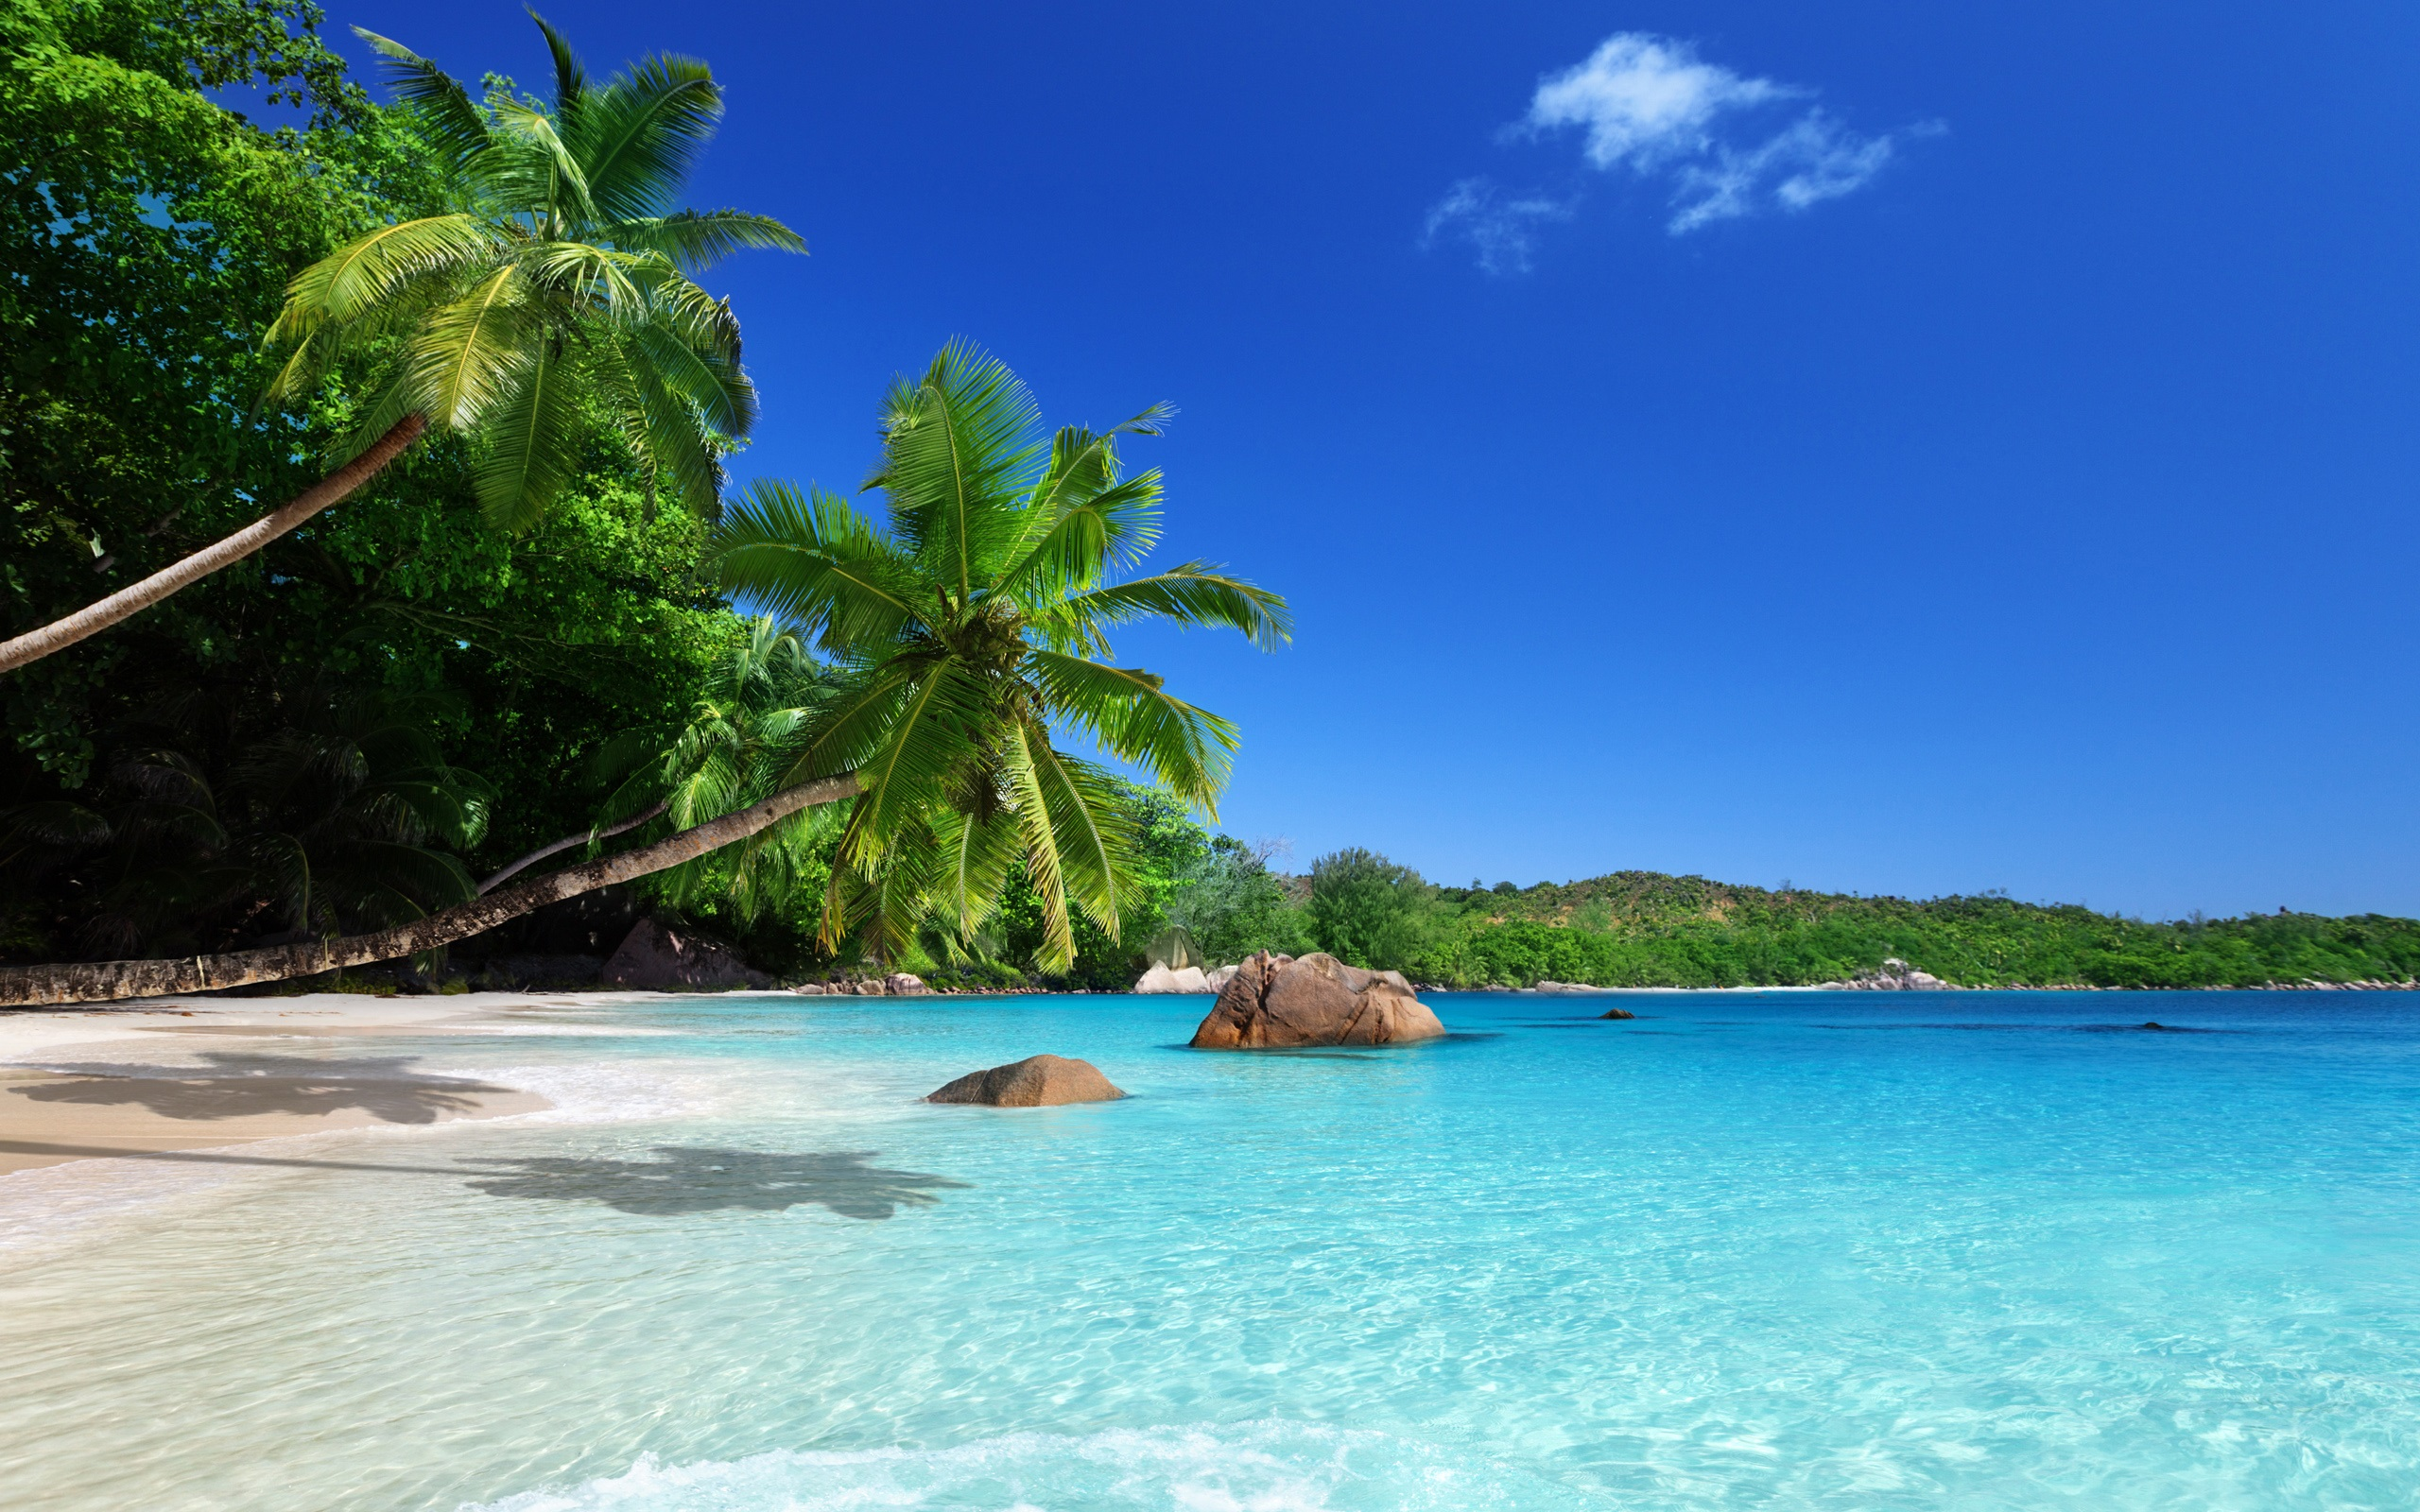 Tropical Paradise Beach Coast Sea Blue Emerald Ocean Palm: Wallpaper Tropical Paradise, Sunshine, Beach, Coast, Sea